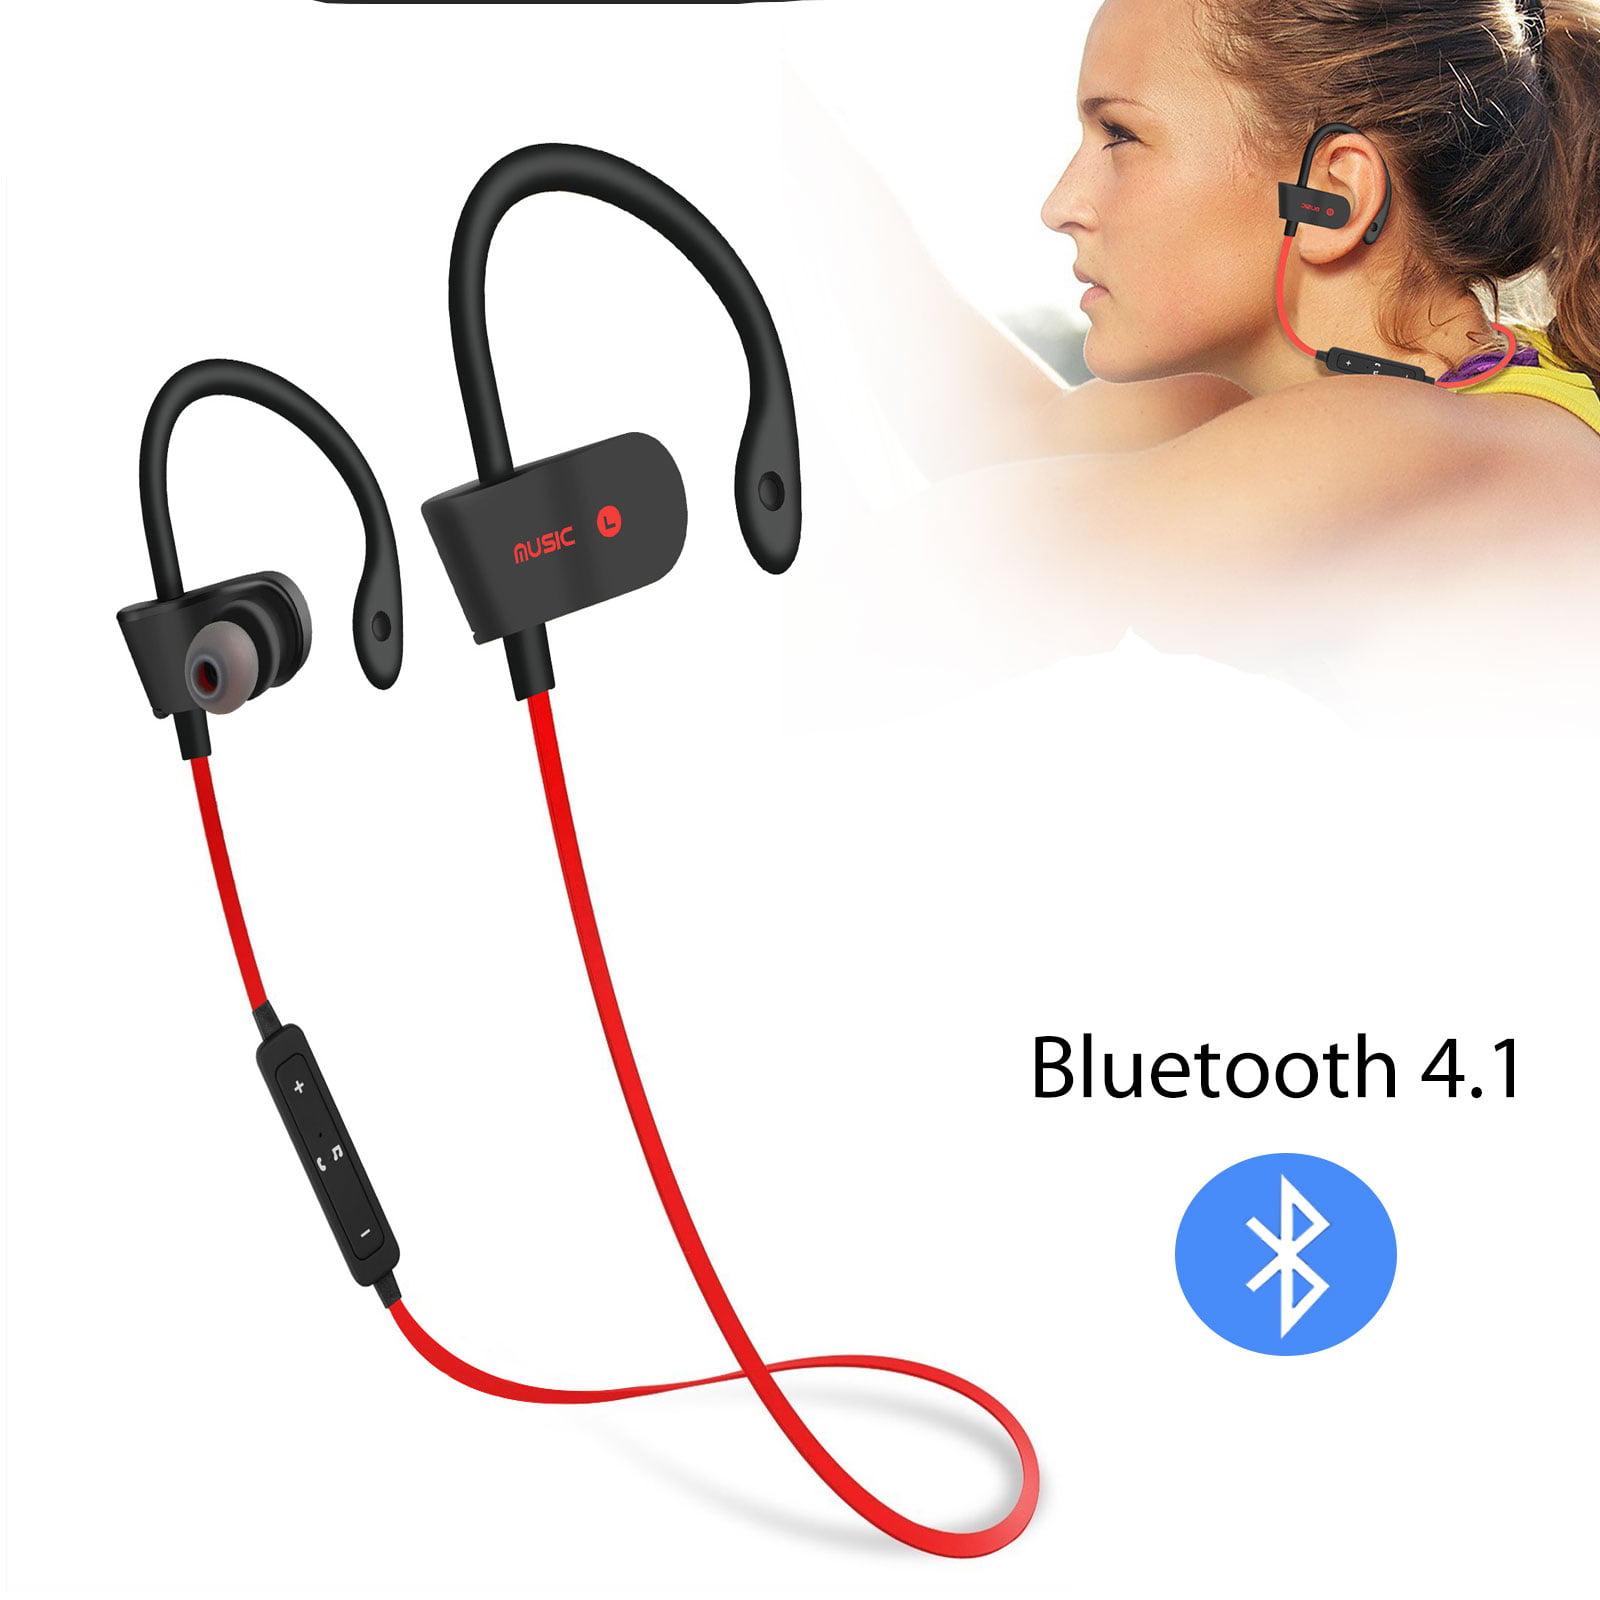 Wireless Bluetooth Earbuds, EEEKit Universal Wireless Bluetooth 4.1 Earphones HD Stereo In-Ear Headset Sport Neckband Headphone Hands-Free with Built-in Mic